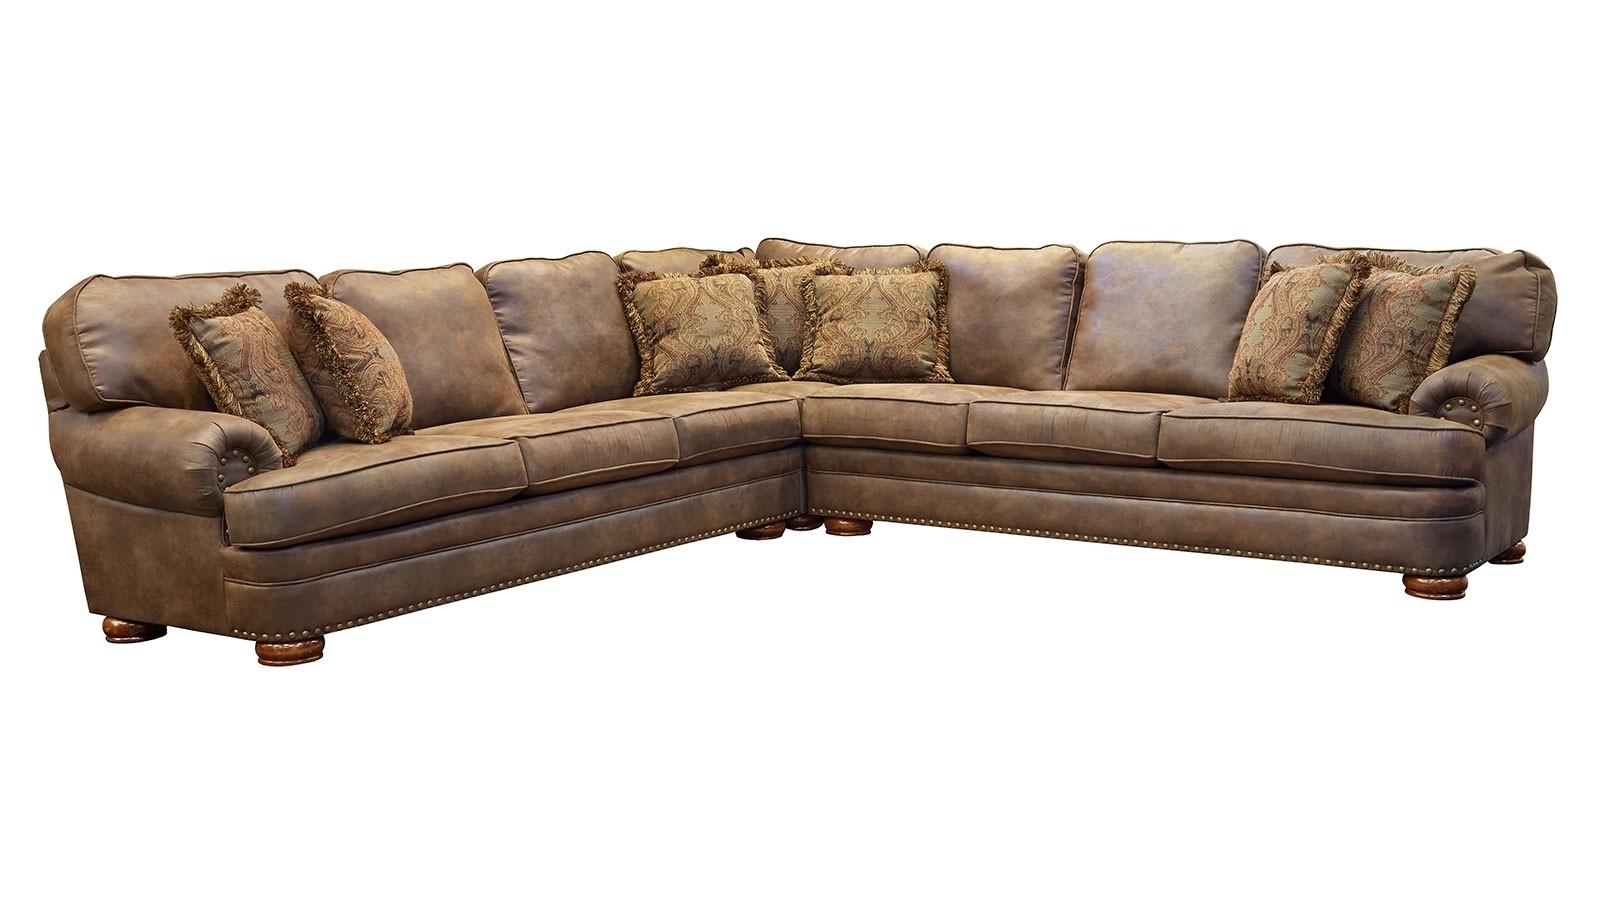 Gallery Furniture Regarding El Paso Texas Sectional Sofas (View 7 of 20)